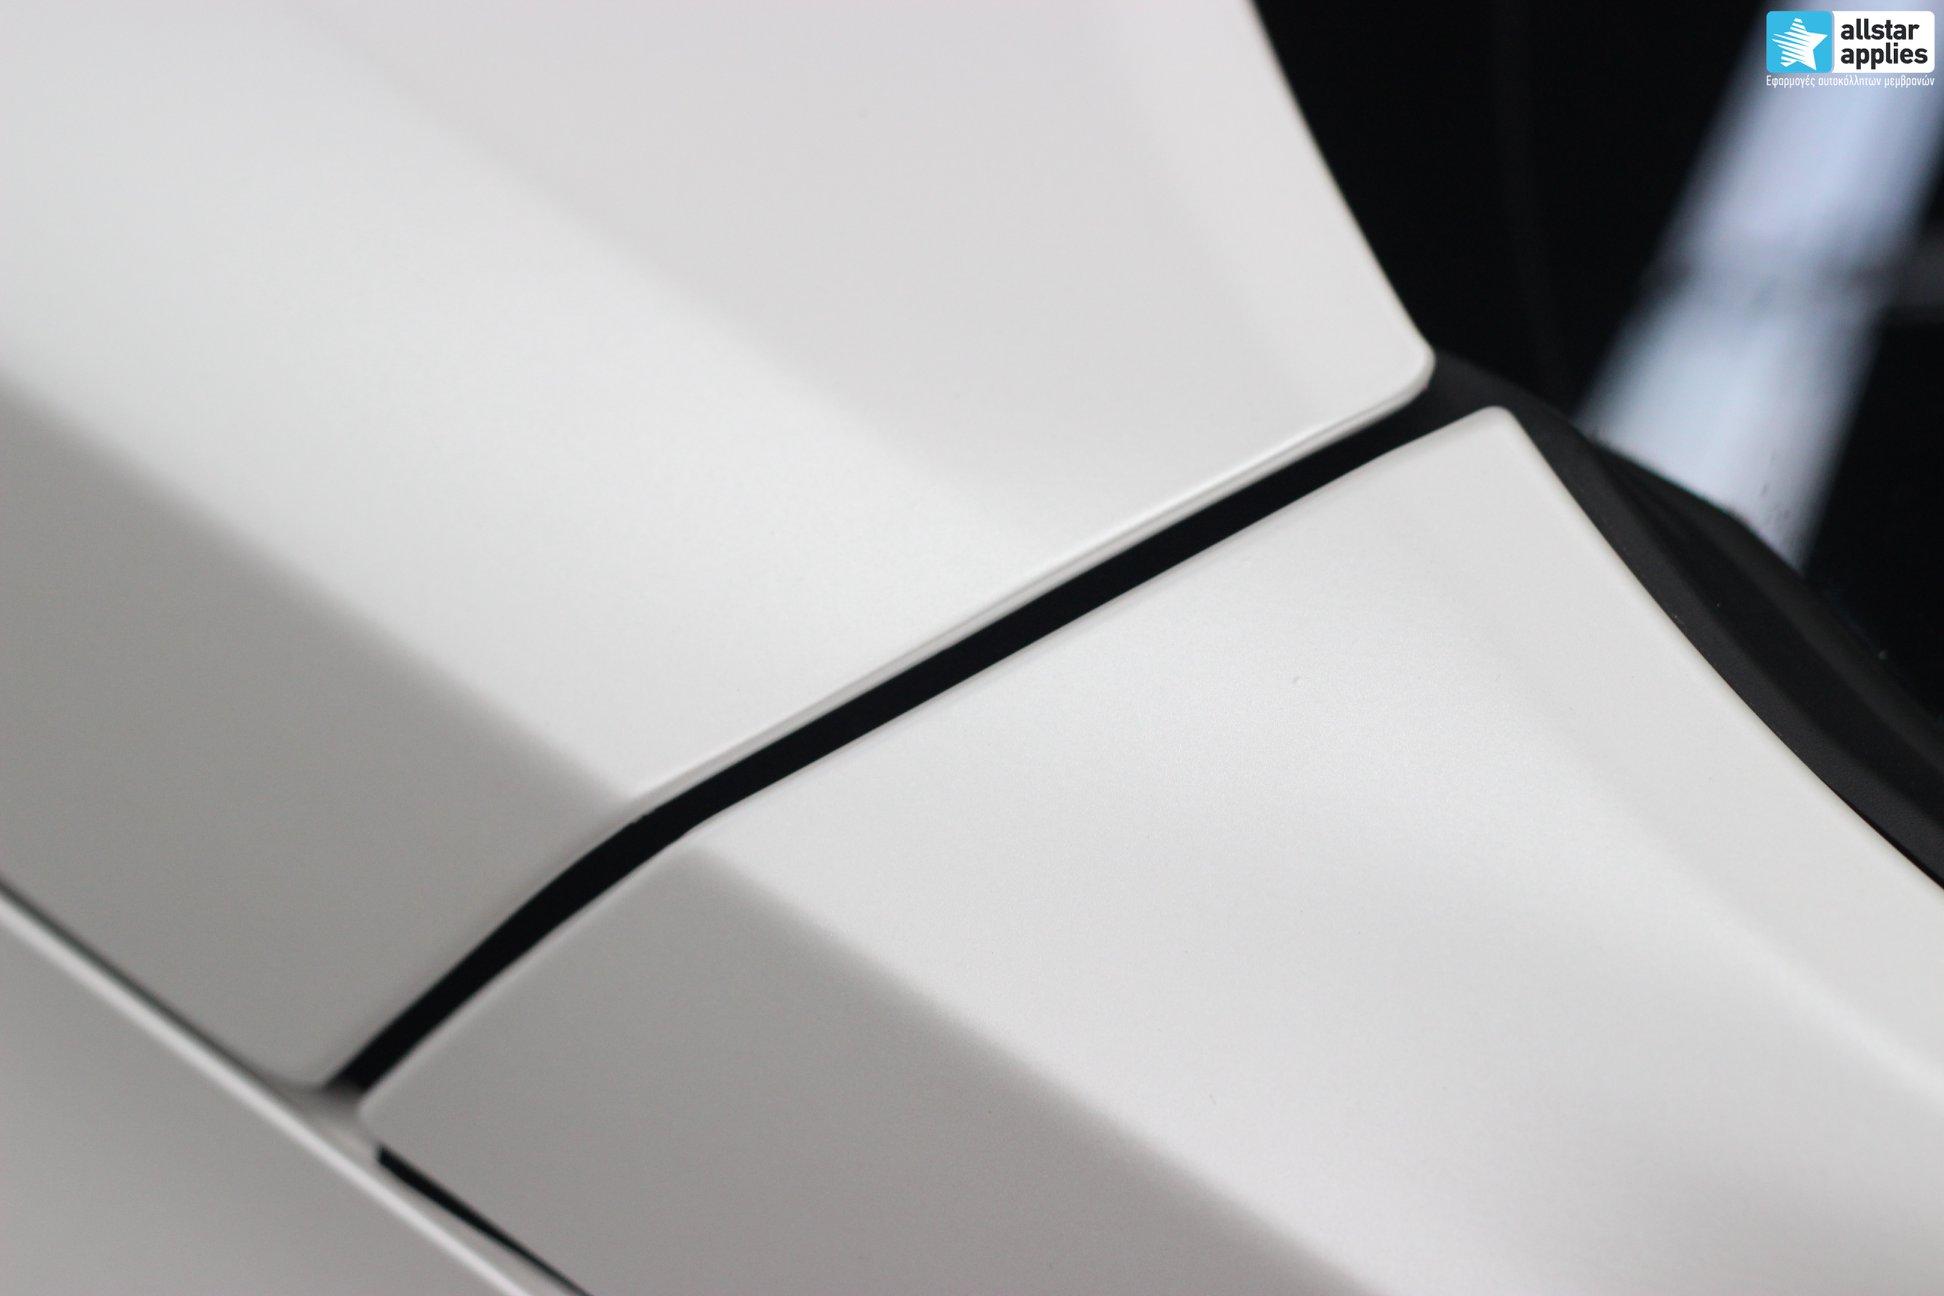 Renault Talisman - Satin Pearl White (4)